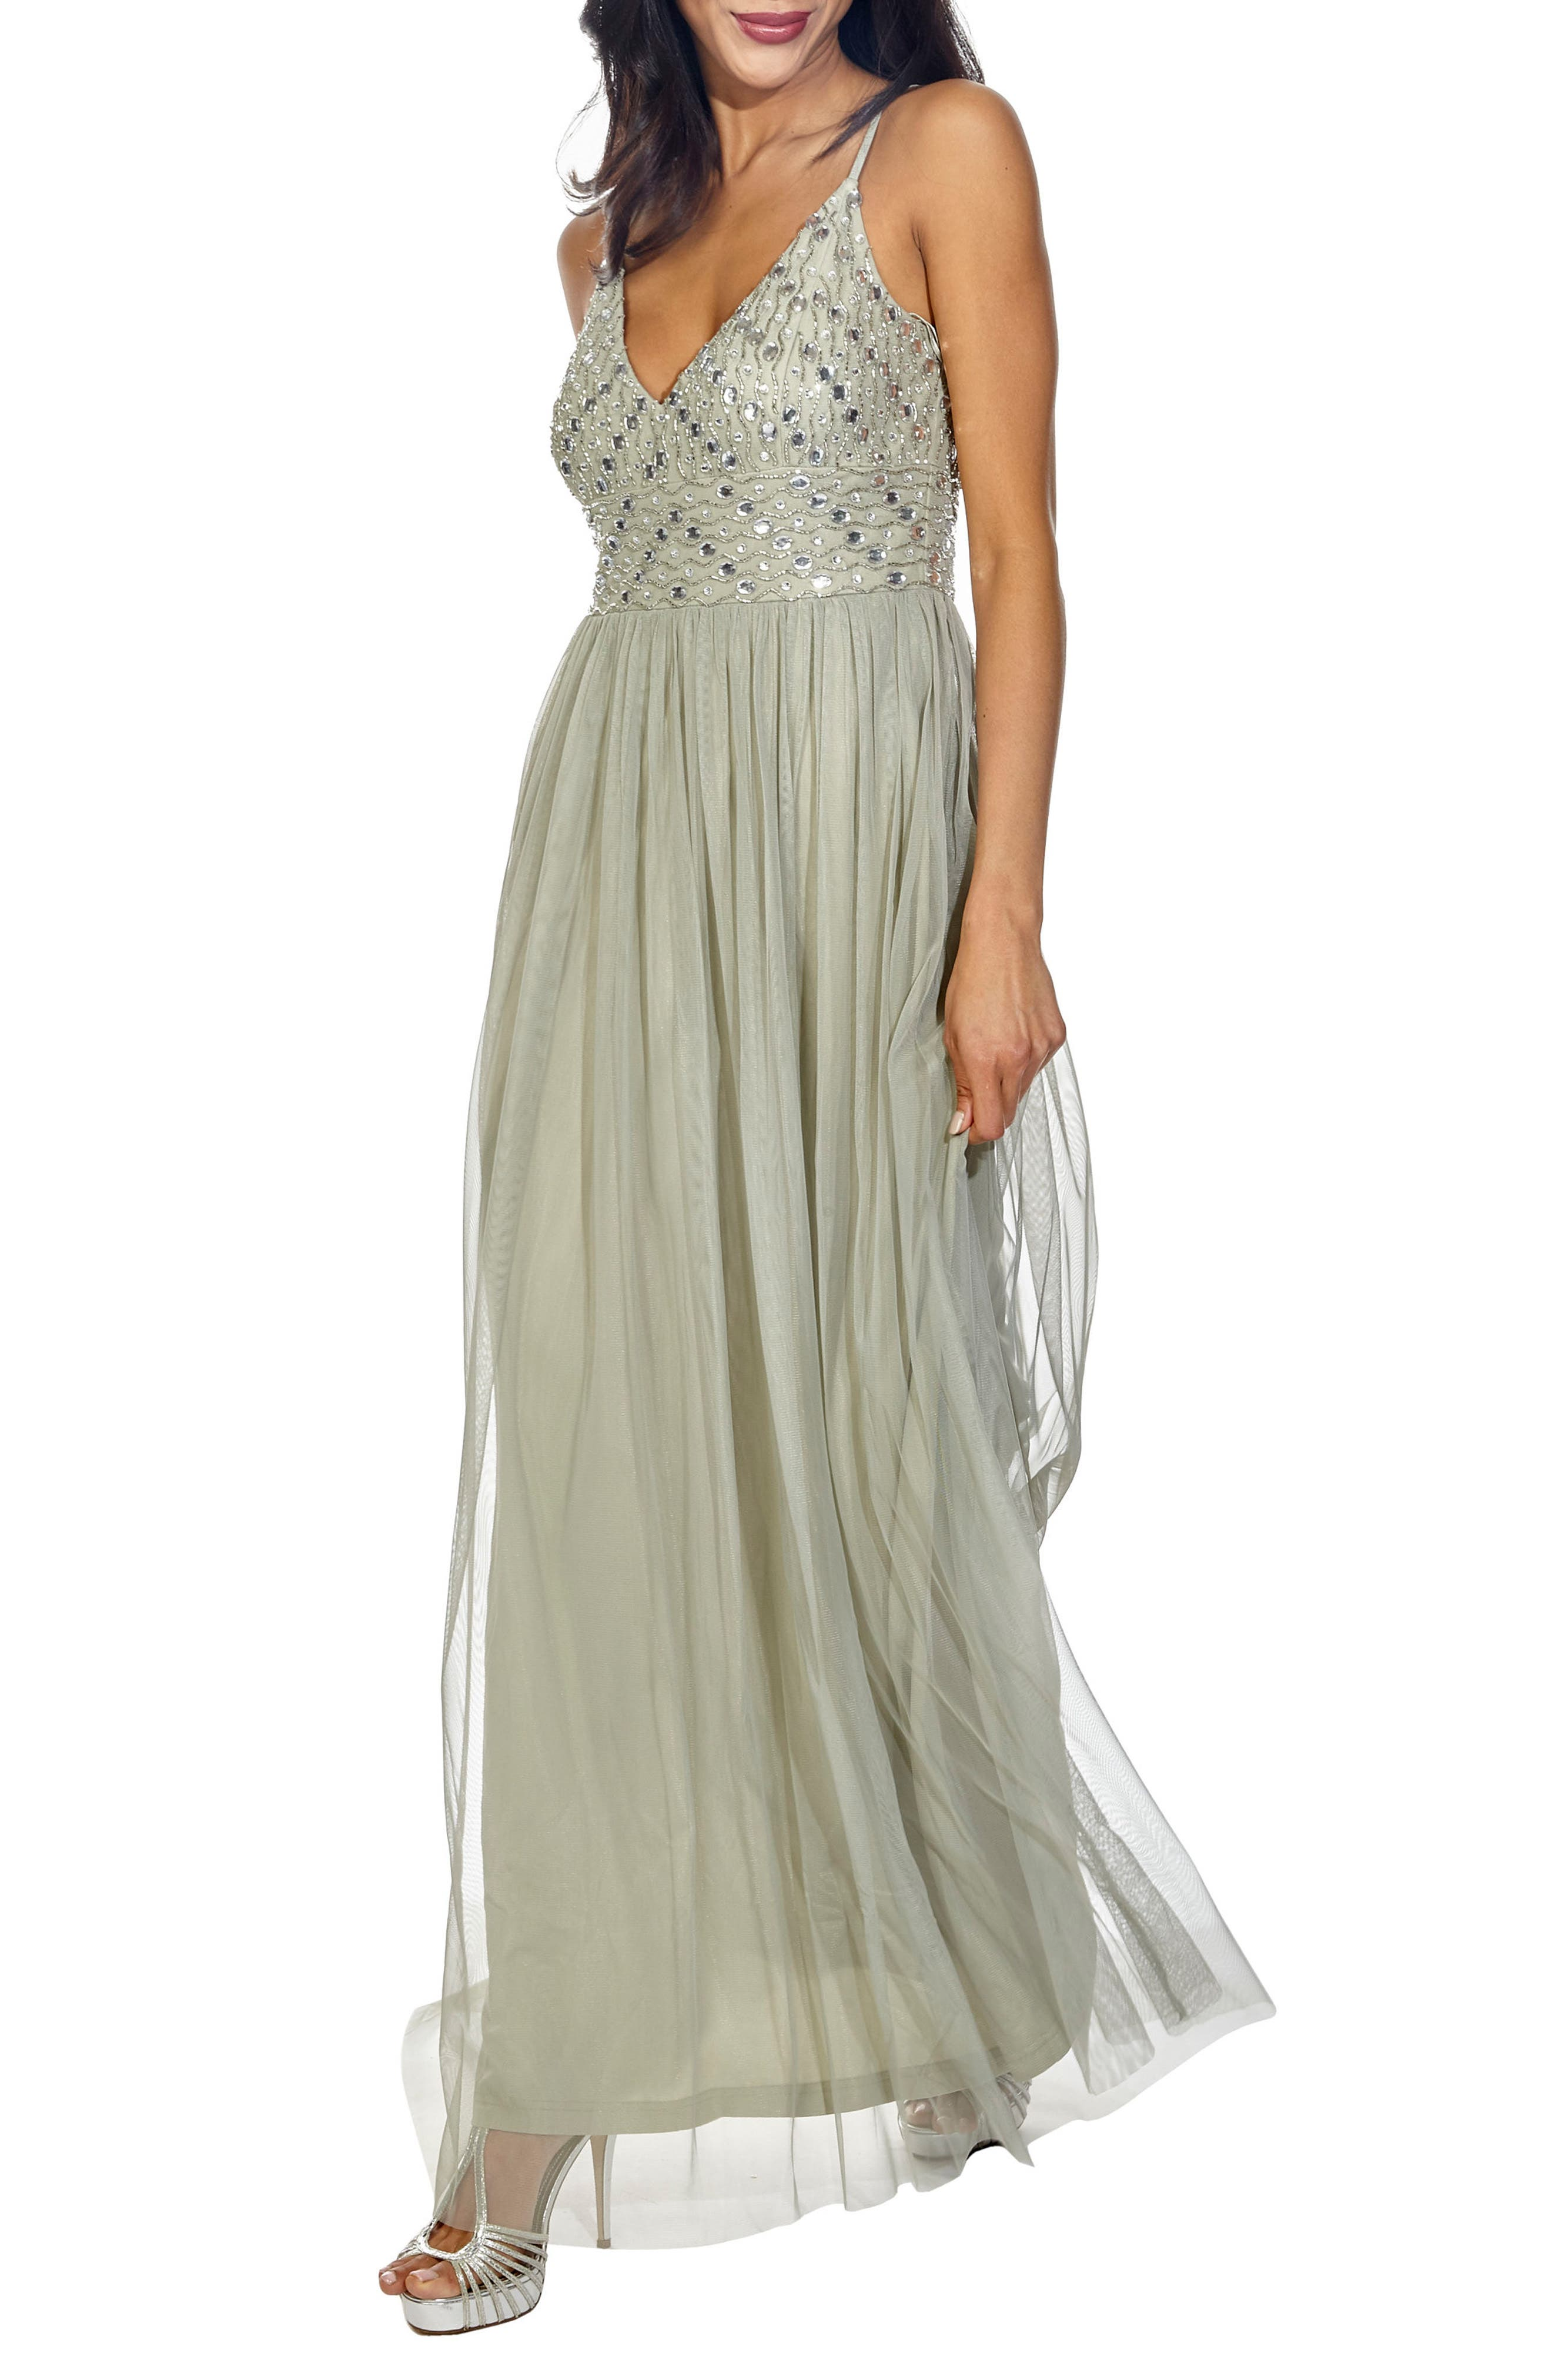 Maeve Beaded Maxi Dress,                             Alternate thumbnail 3, color,                             330